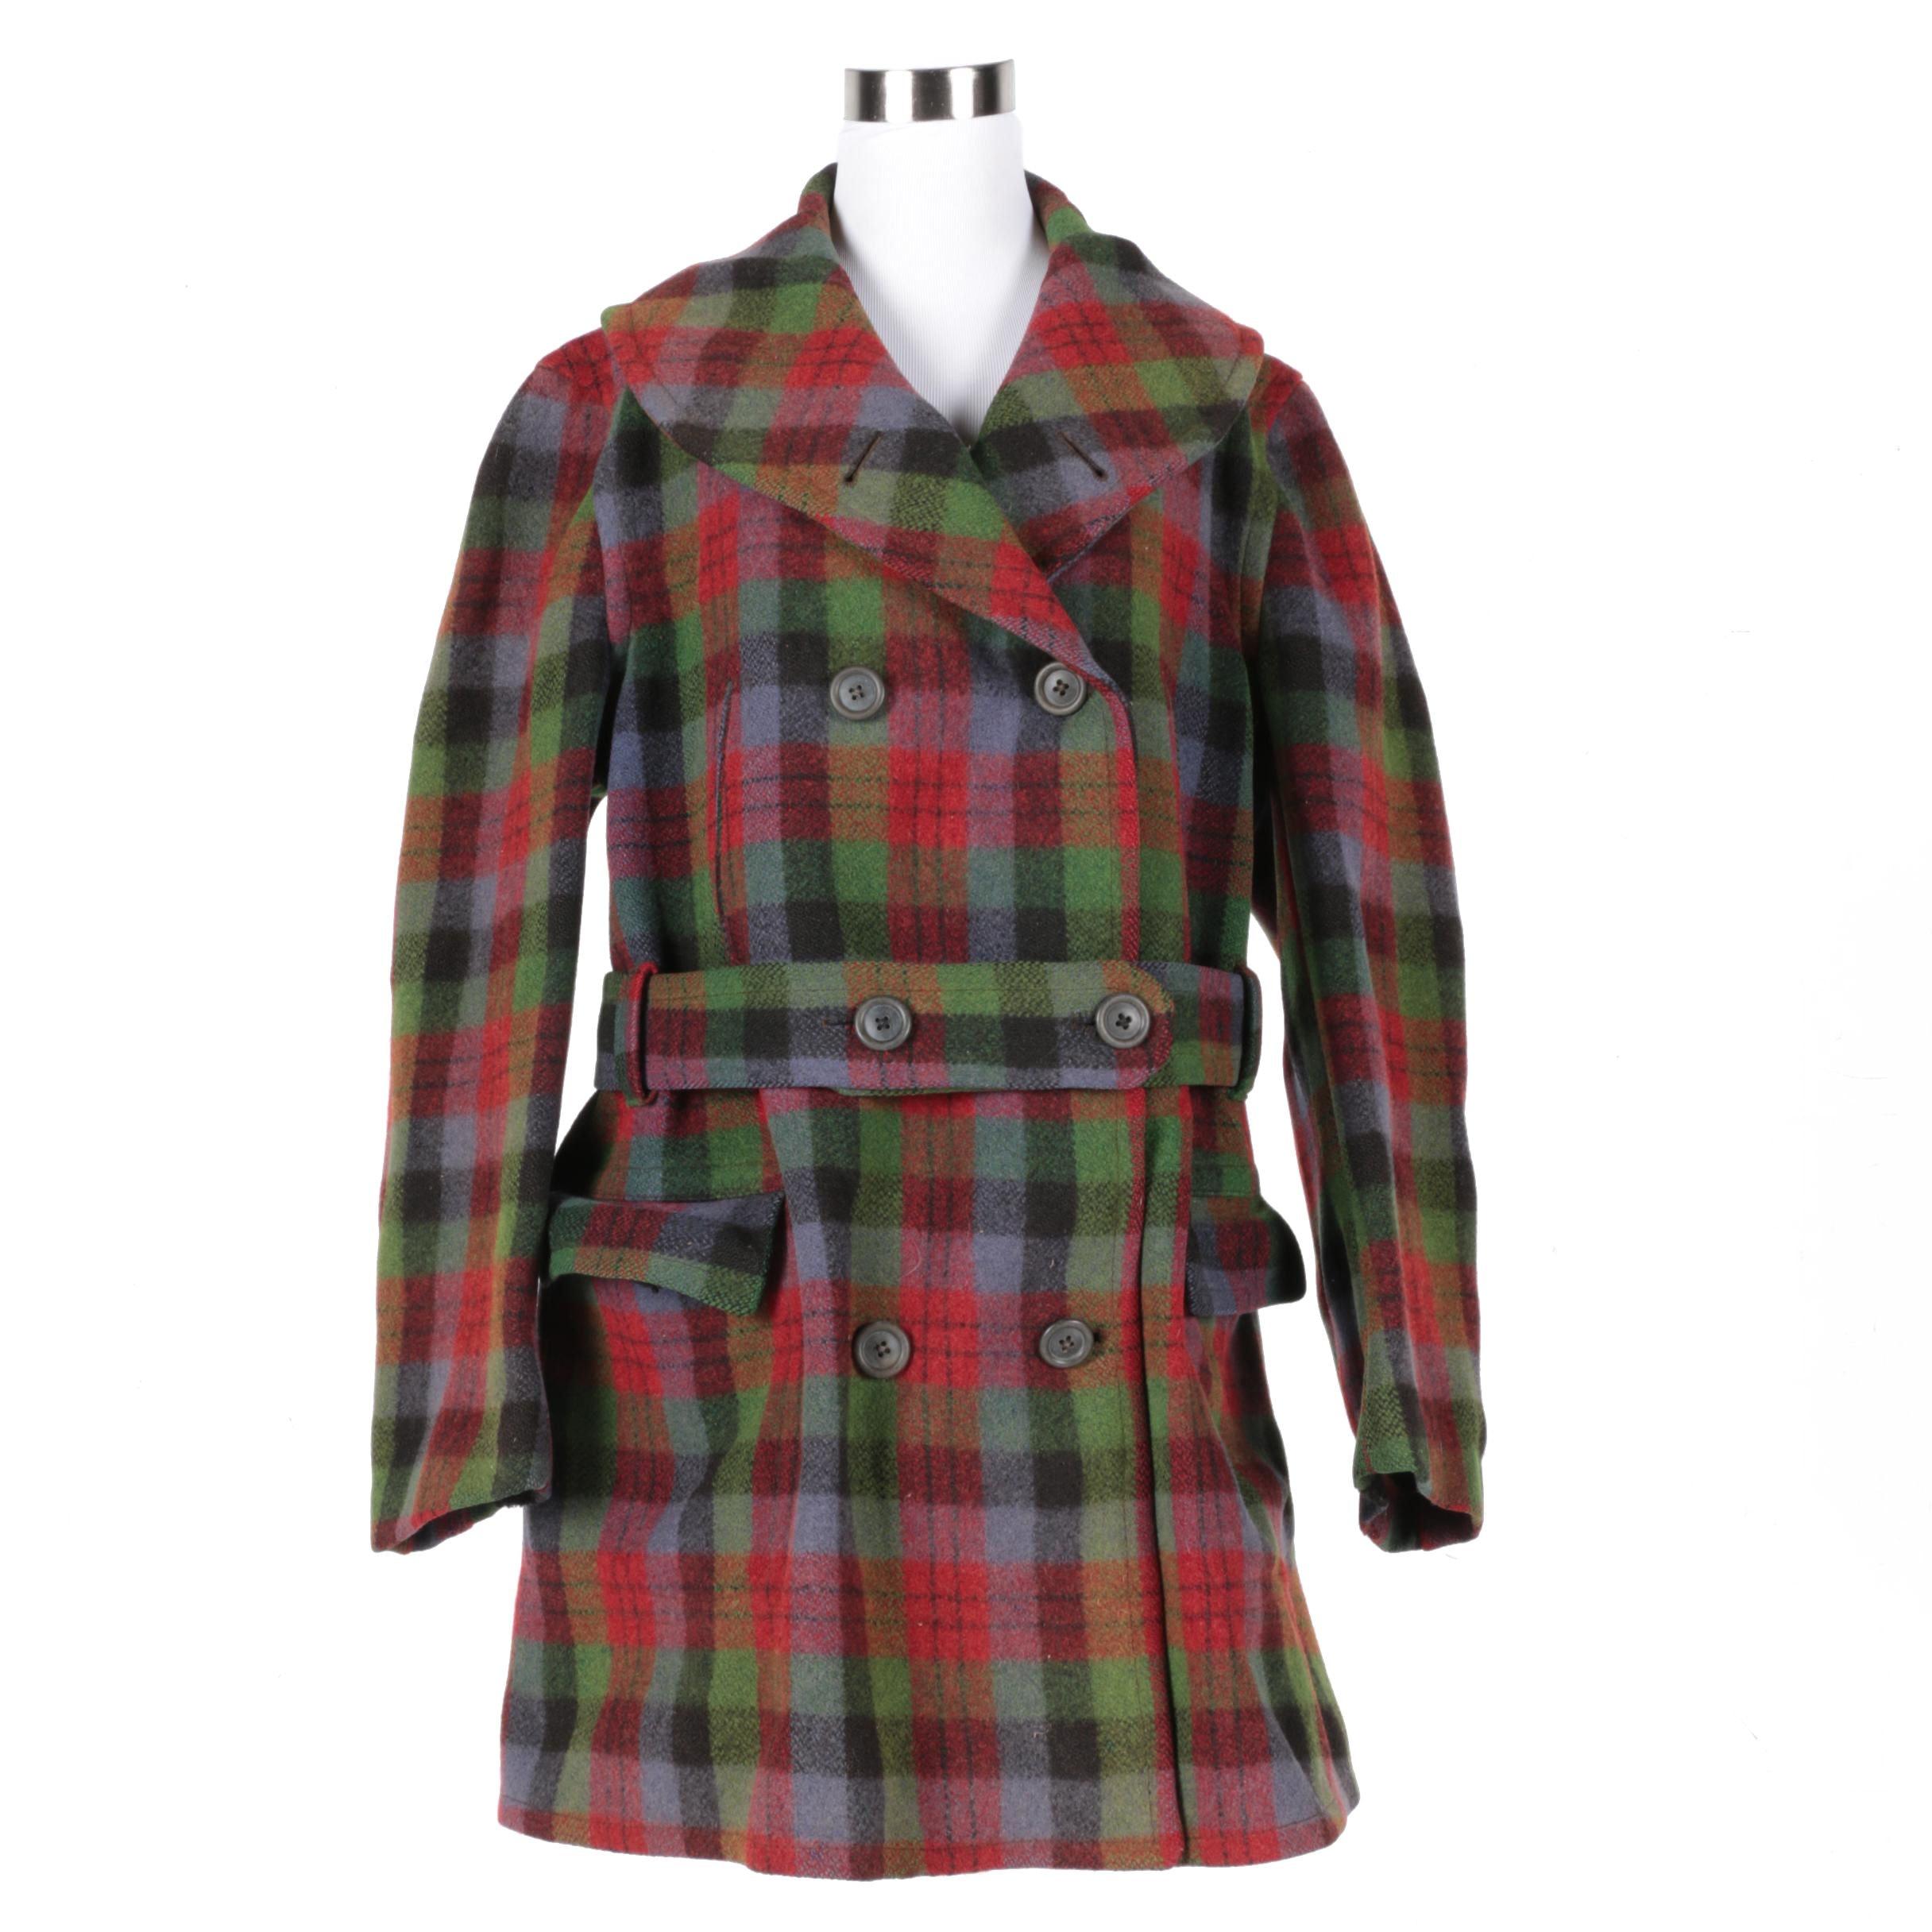 Women's Vintage Wool Coat